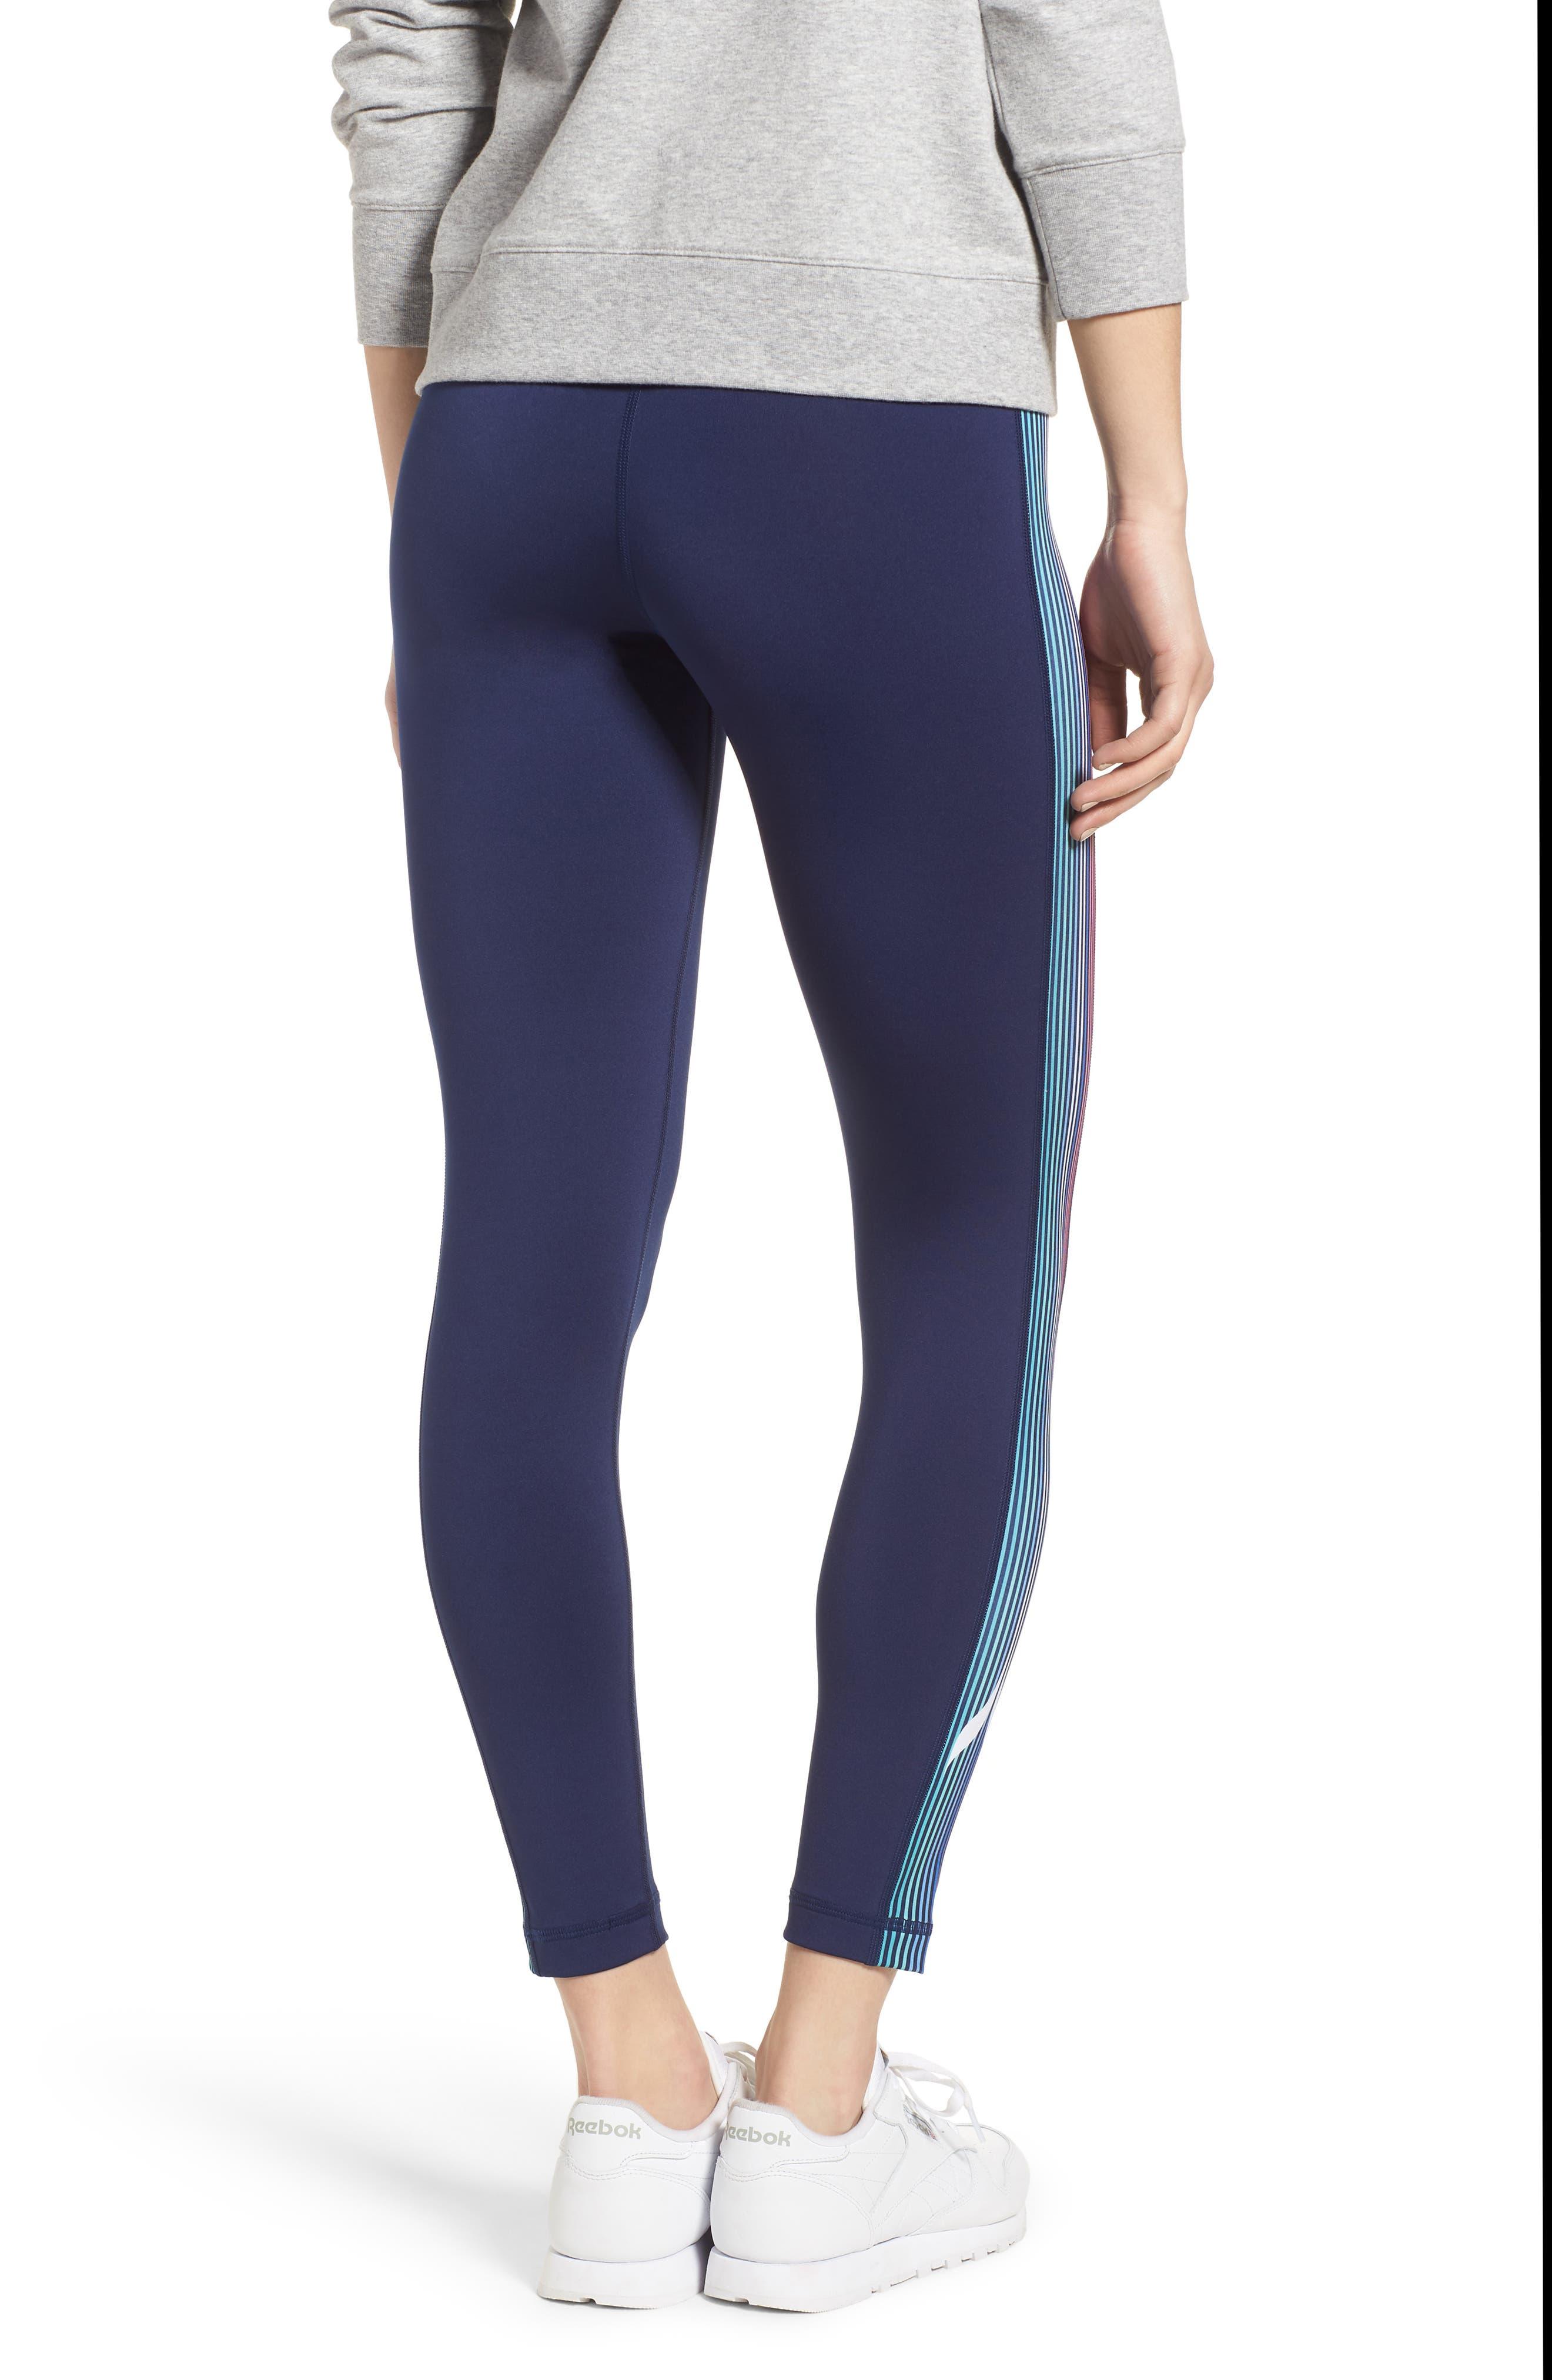 Whale Stripe Sports Leggings,                             Alternate thumbnail 2, color,                             476